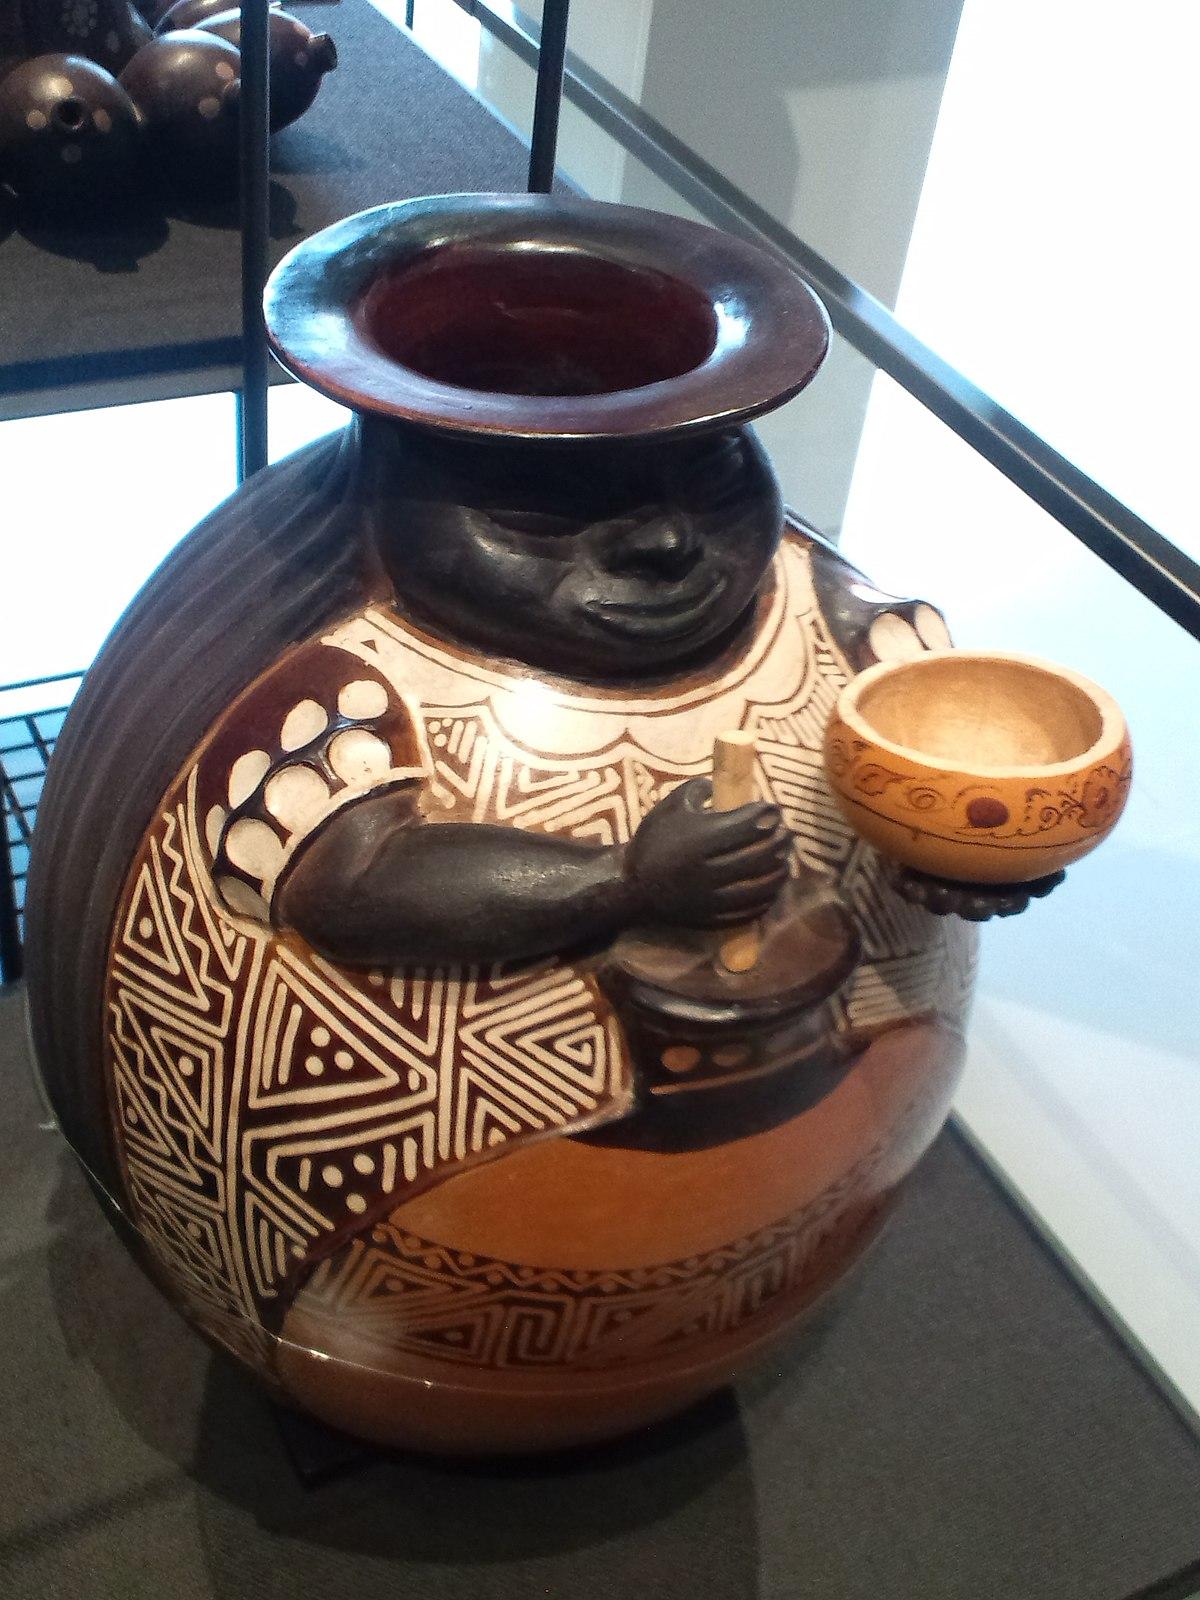 Cer mica de chulucanas wikipedia la enciclopedia libre - Fotos de ceramica ...